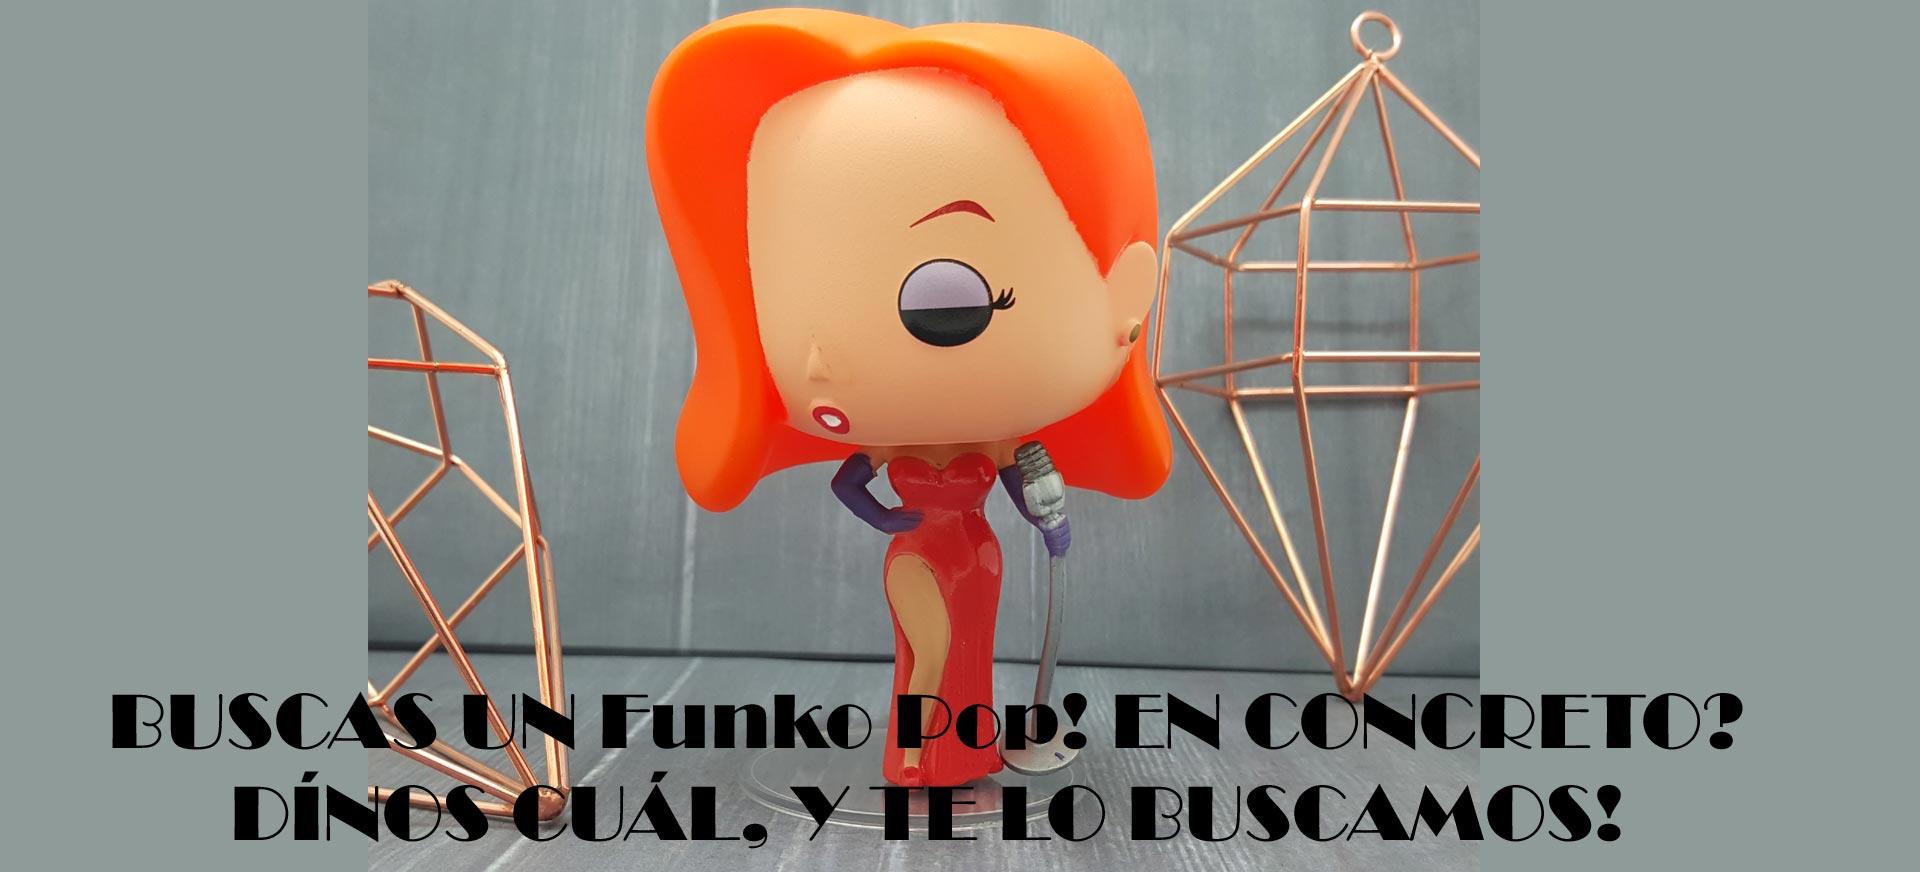 Buscas un Funko Pop?